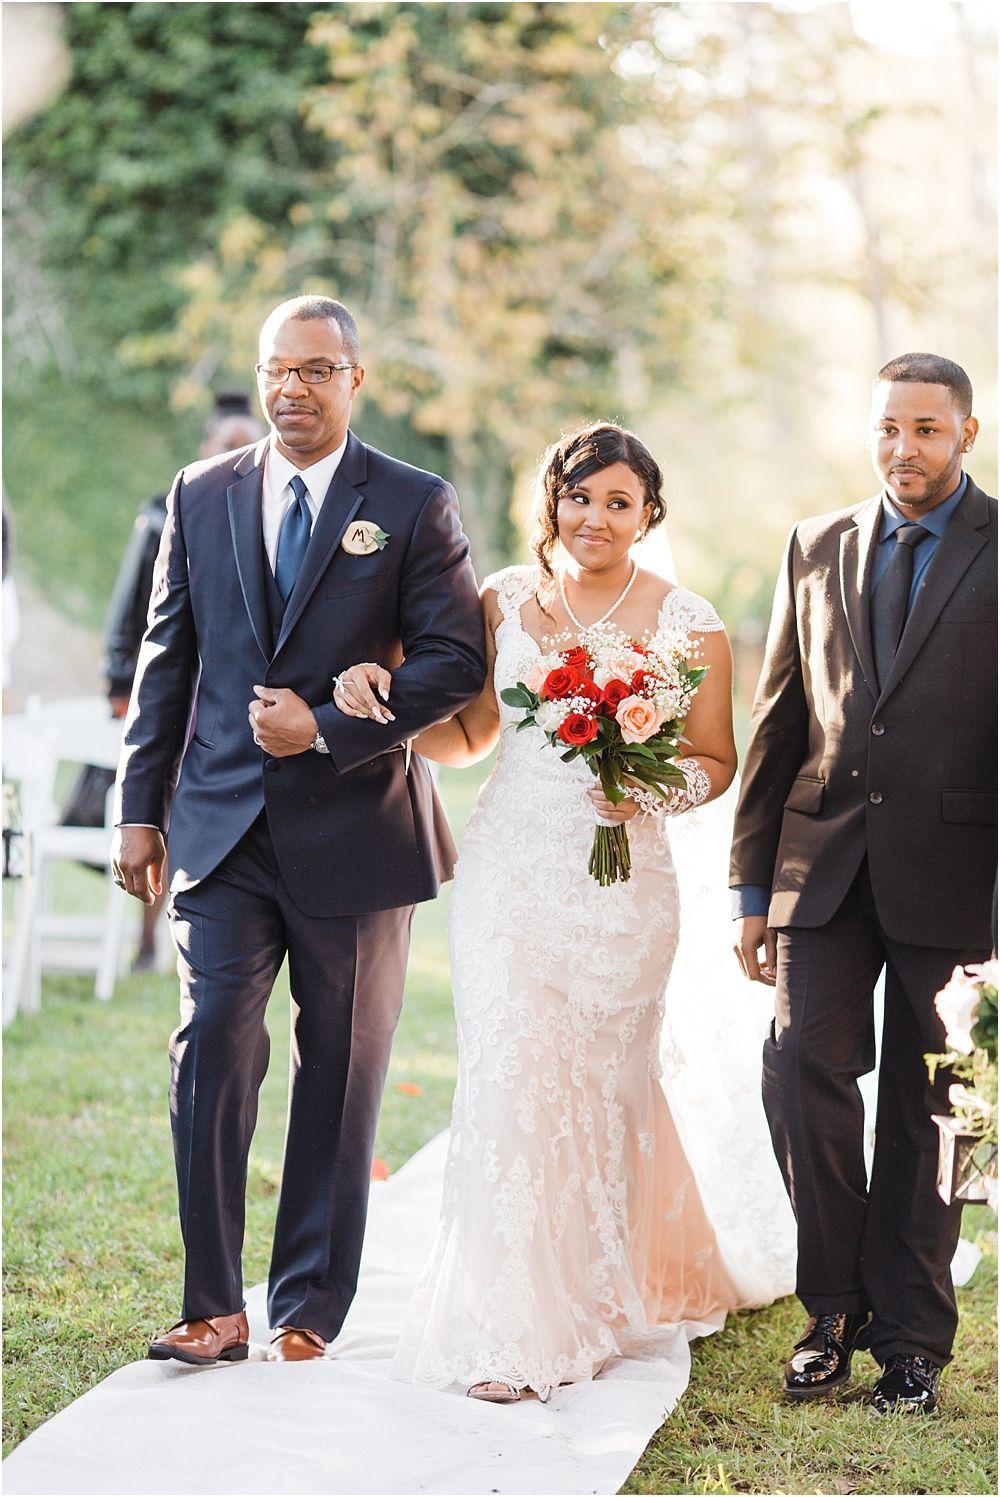 Taylar Dennis Wedding At Kirk House Gardens Mobile Alabama Photographer Jennie Tewellmobile Tewell